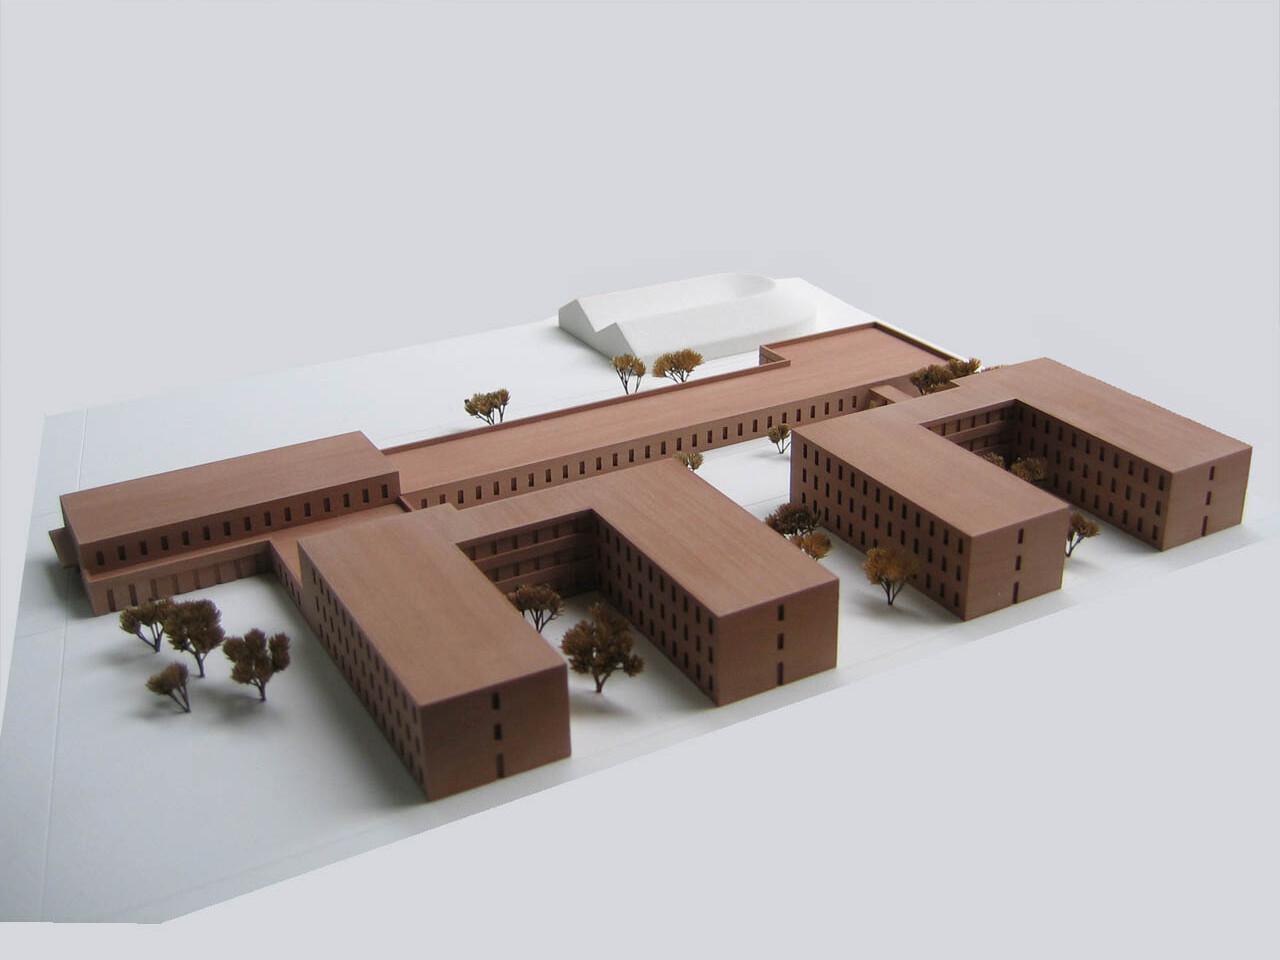 Wettbewerb Berlin, Justizvollzugsanstalt Düppel